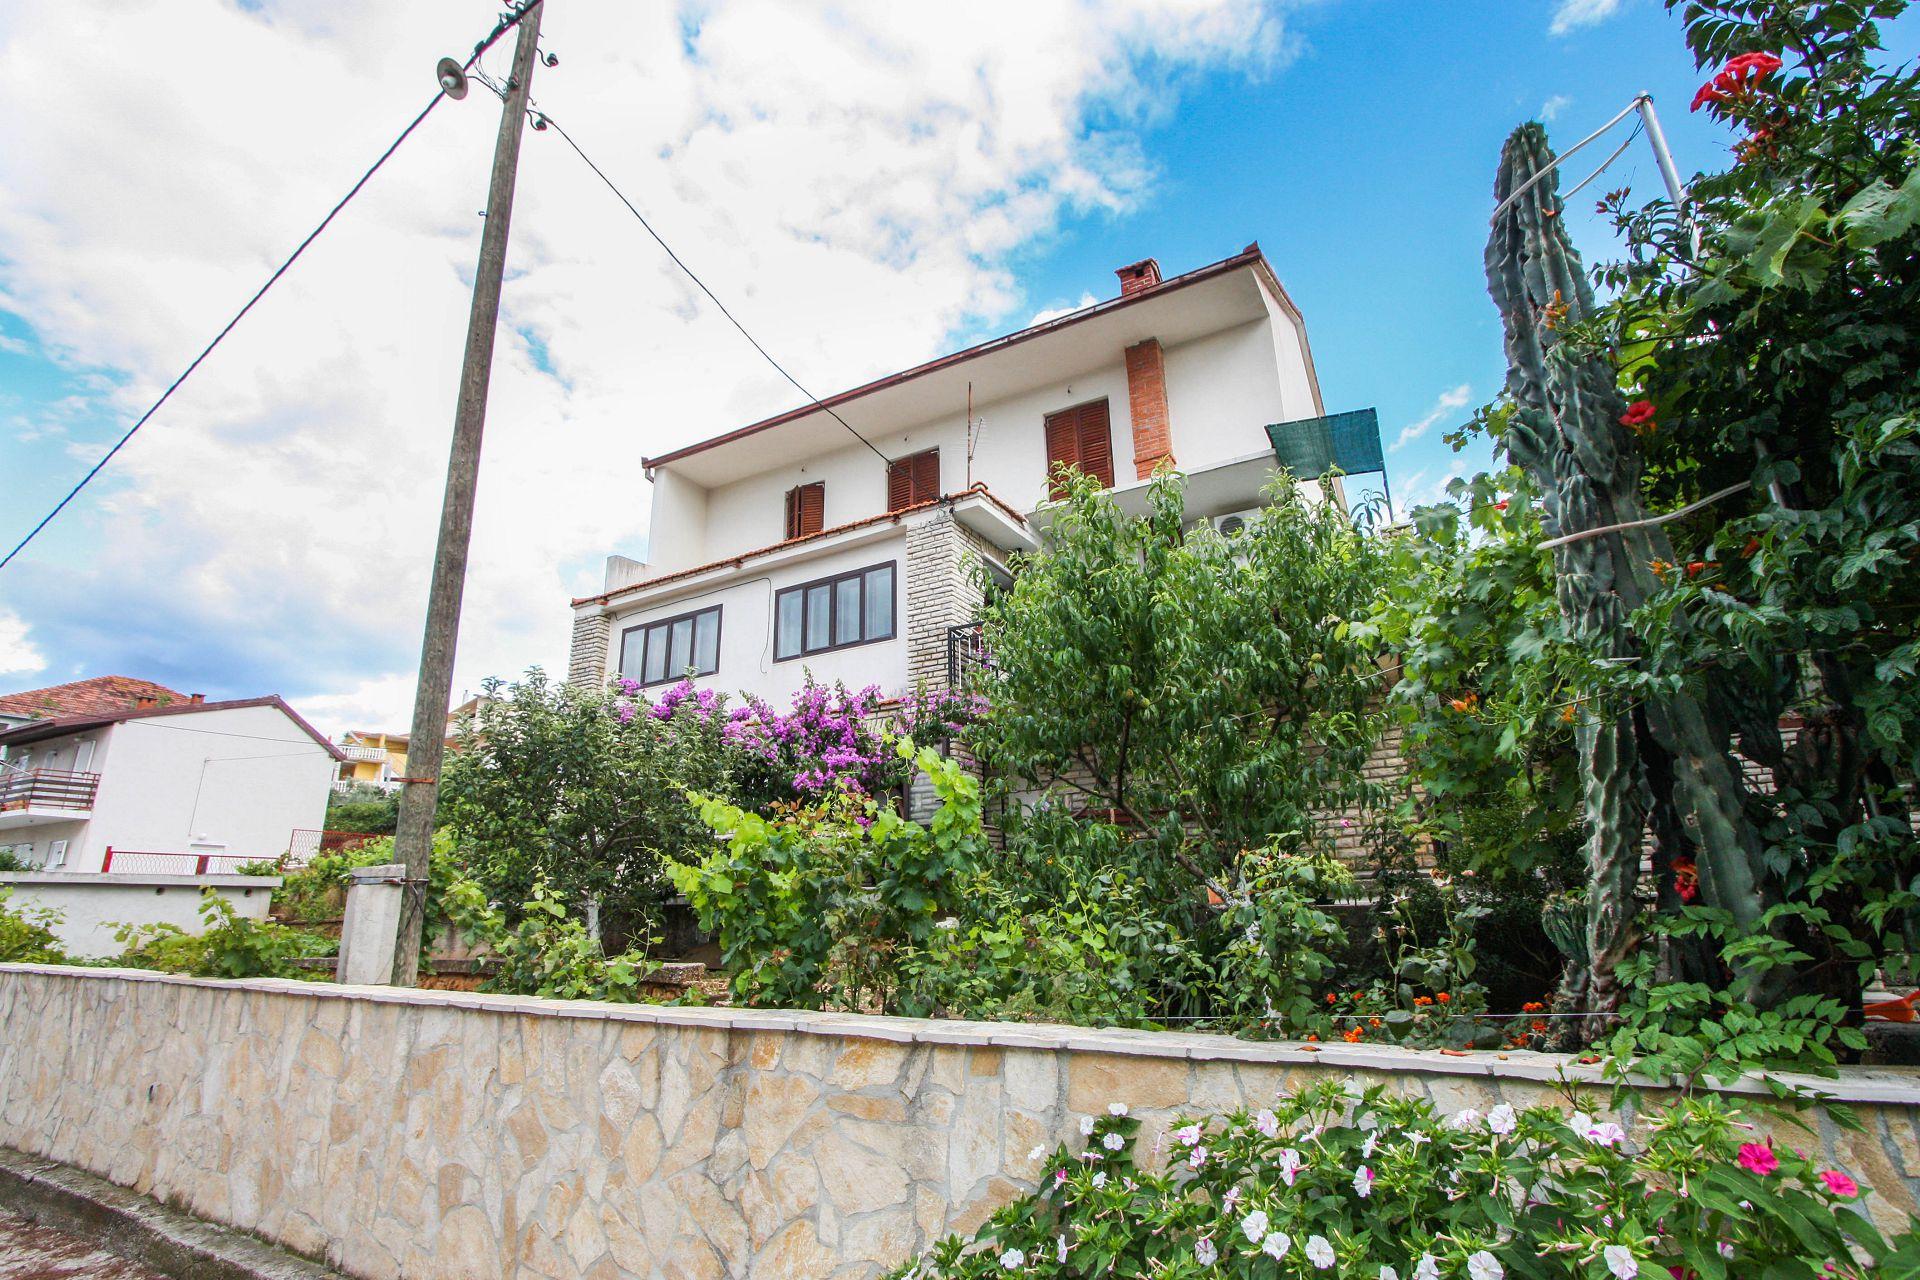 35895 - Arbanija - Appartementen Kroatië